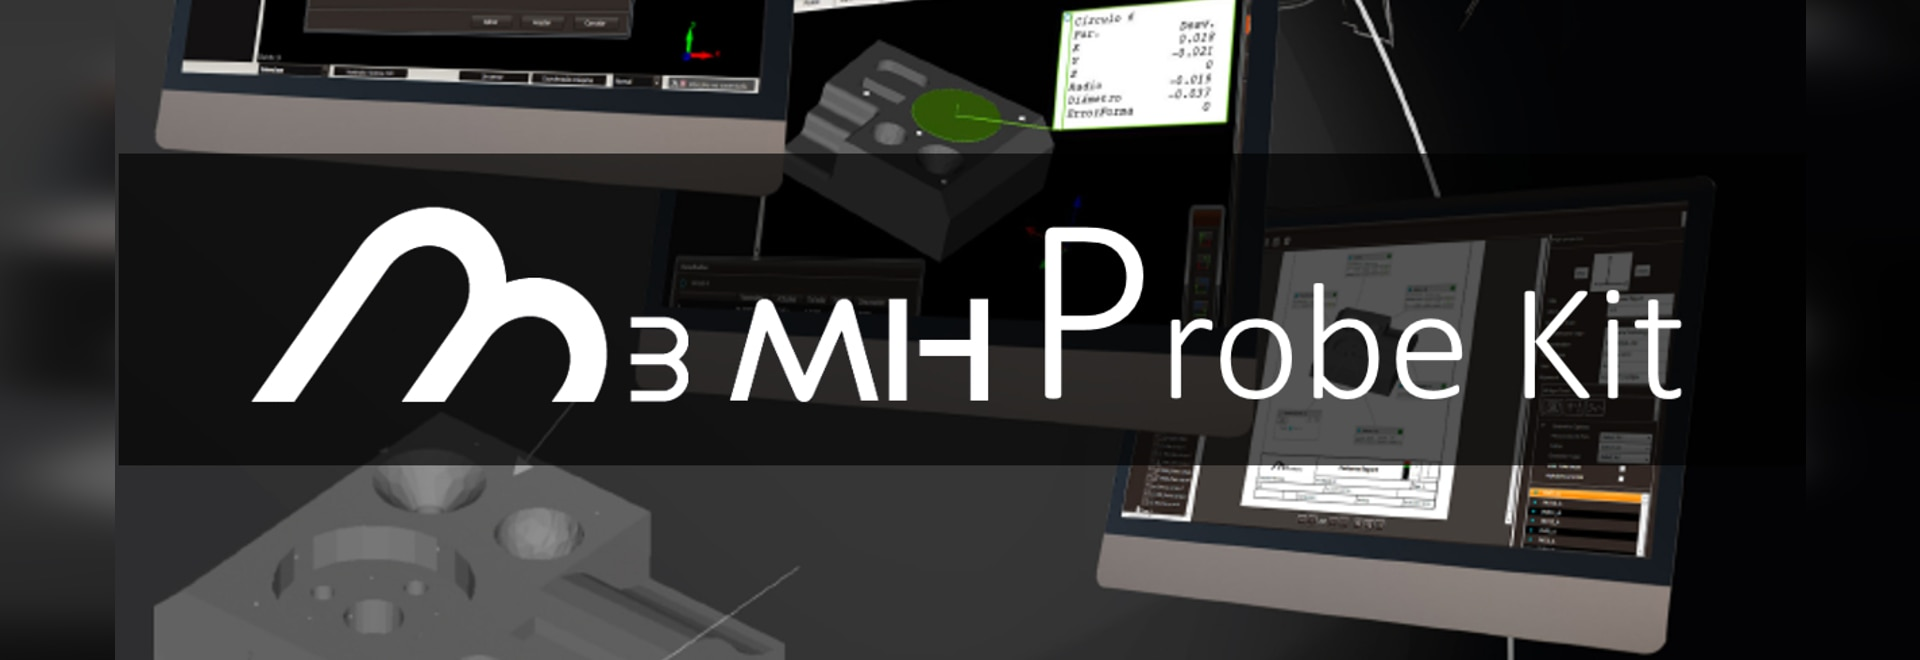 M3MH Probe Kit